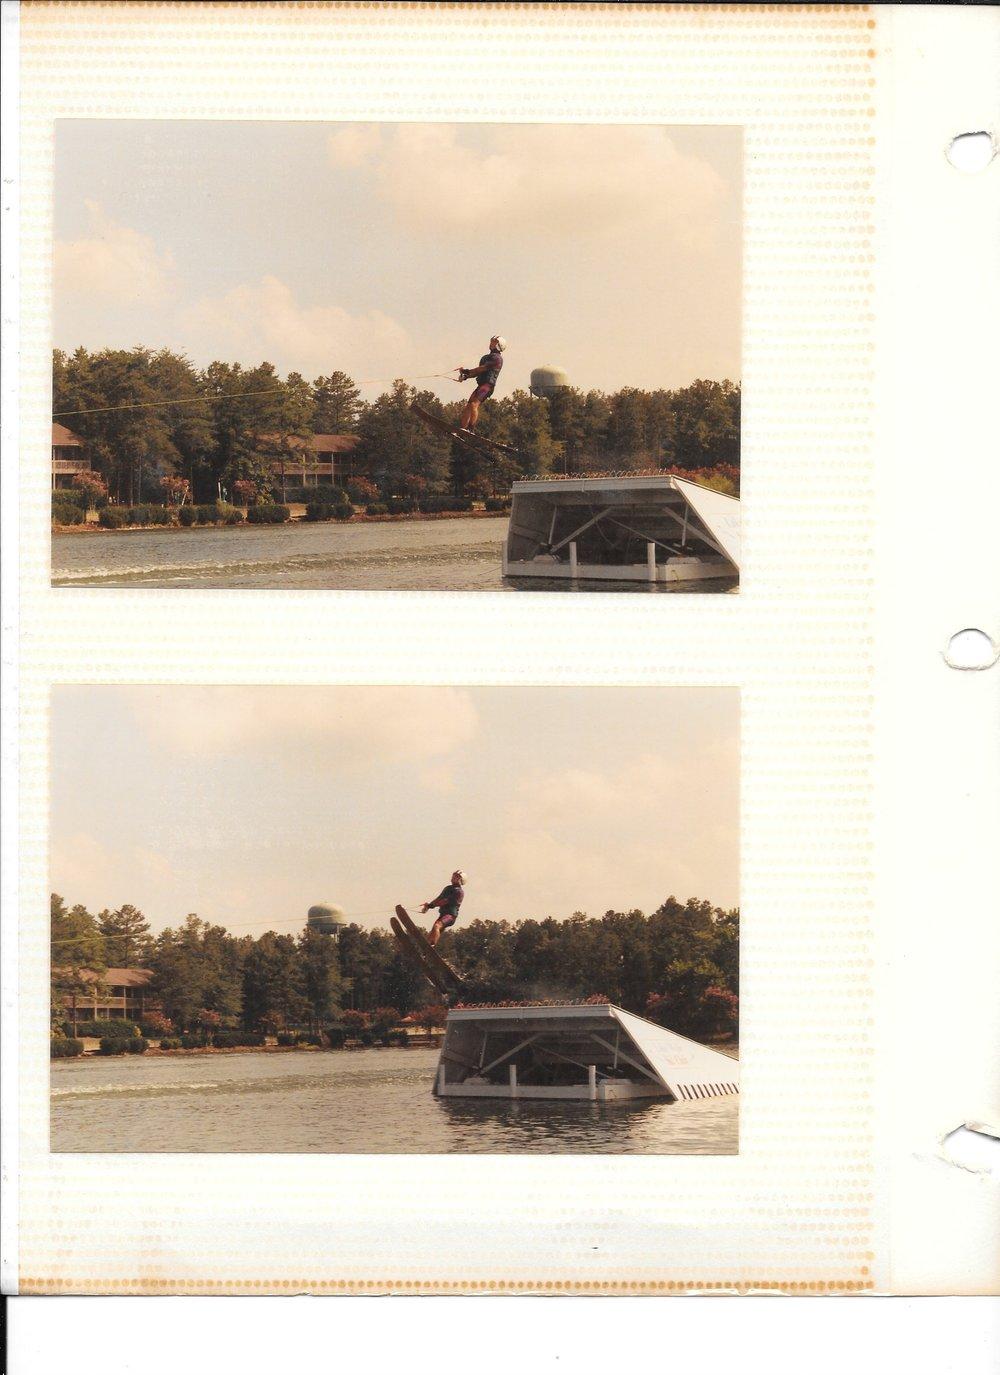 jump ramp 5.jpg